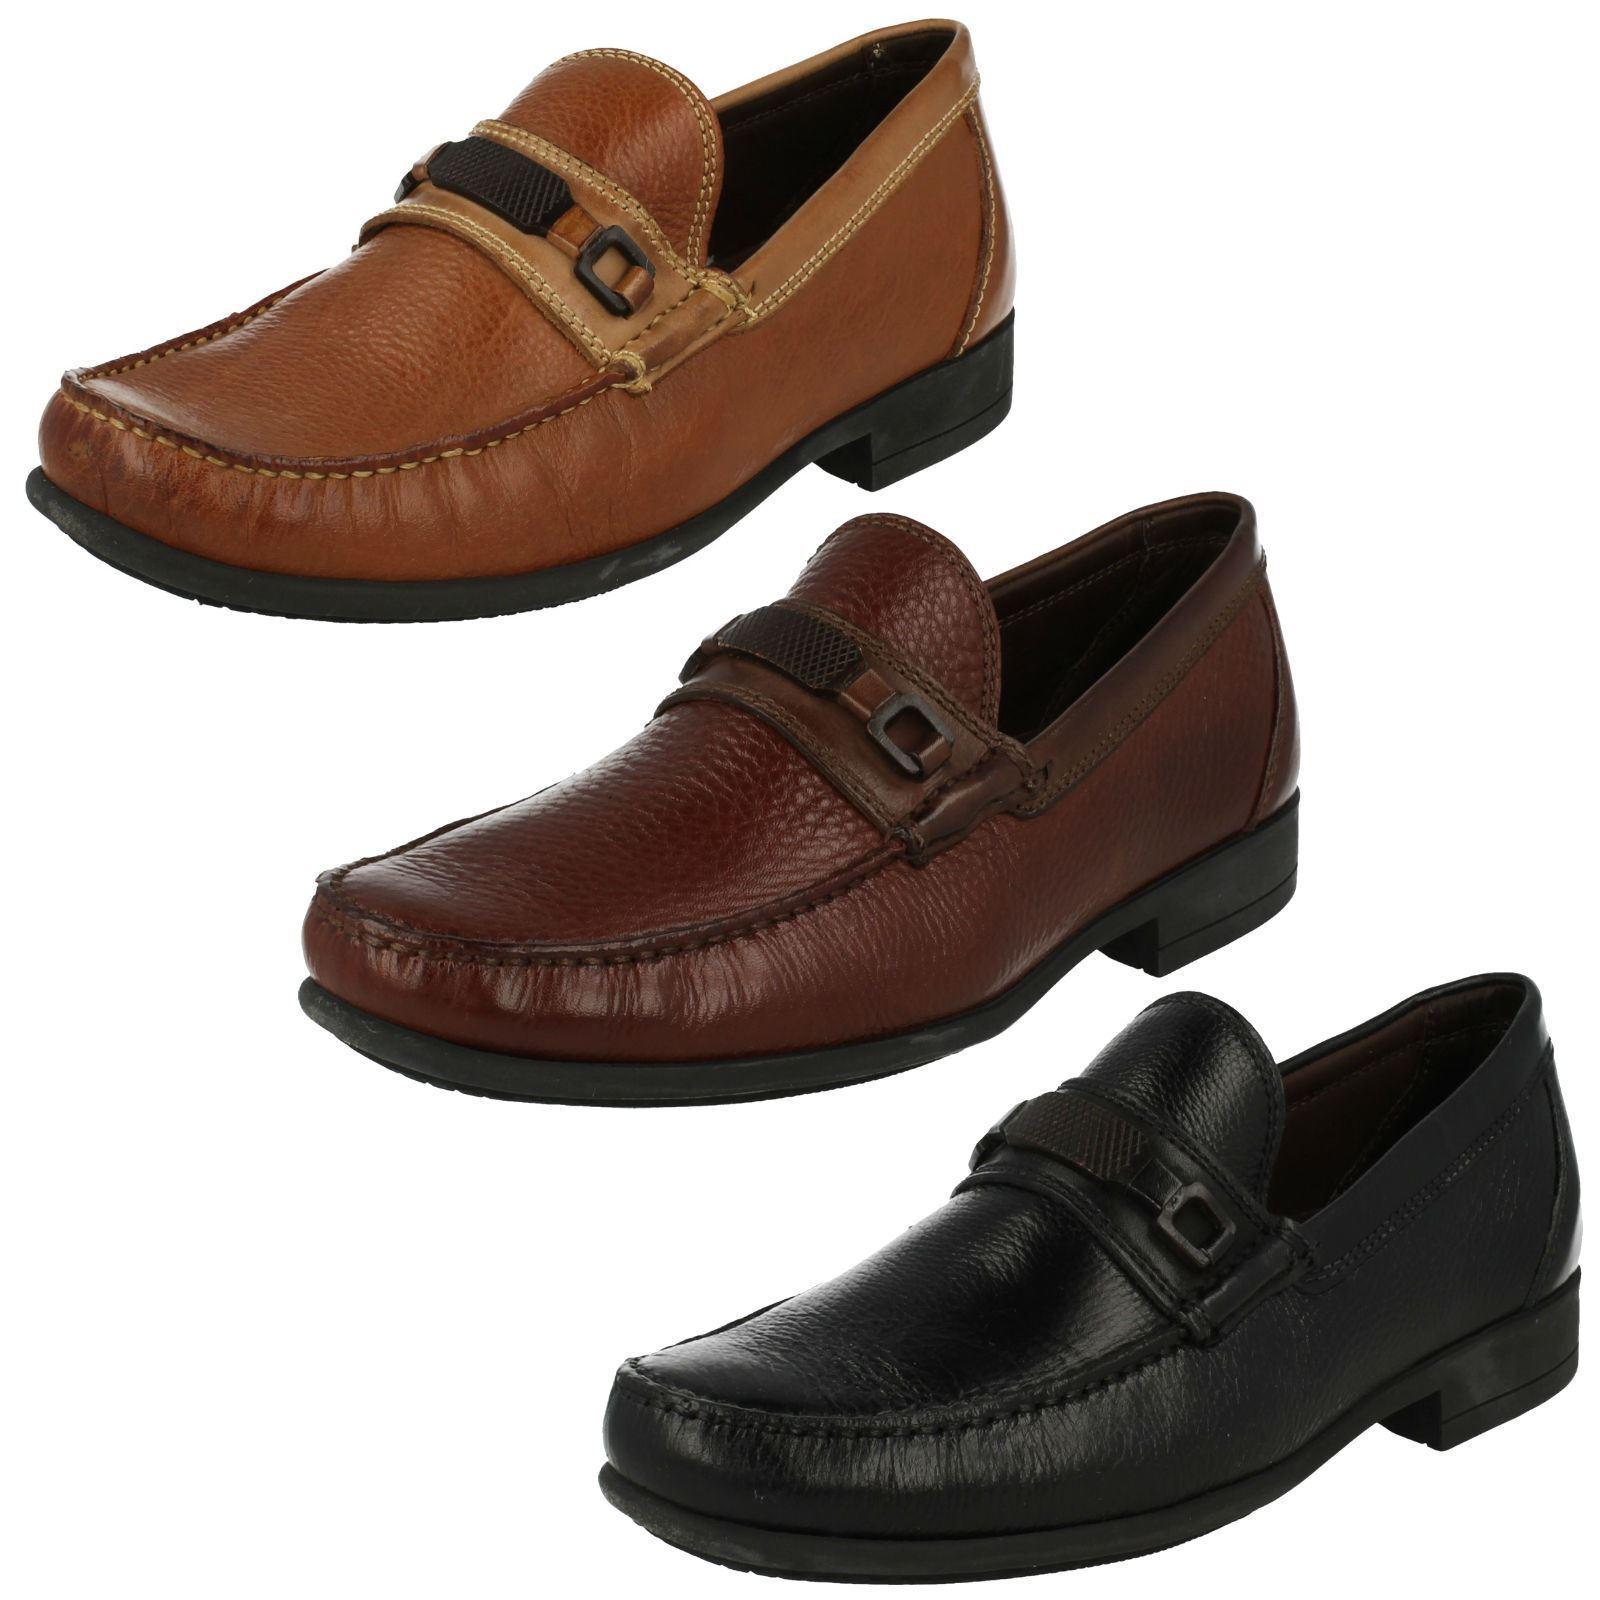 Herren Anatomic & Co Formal Slip Slip Formal On Fastening Leder Schuhes - 'Lins' b33a2b